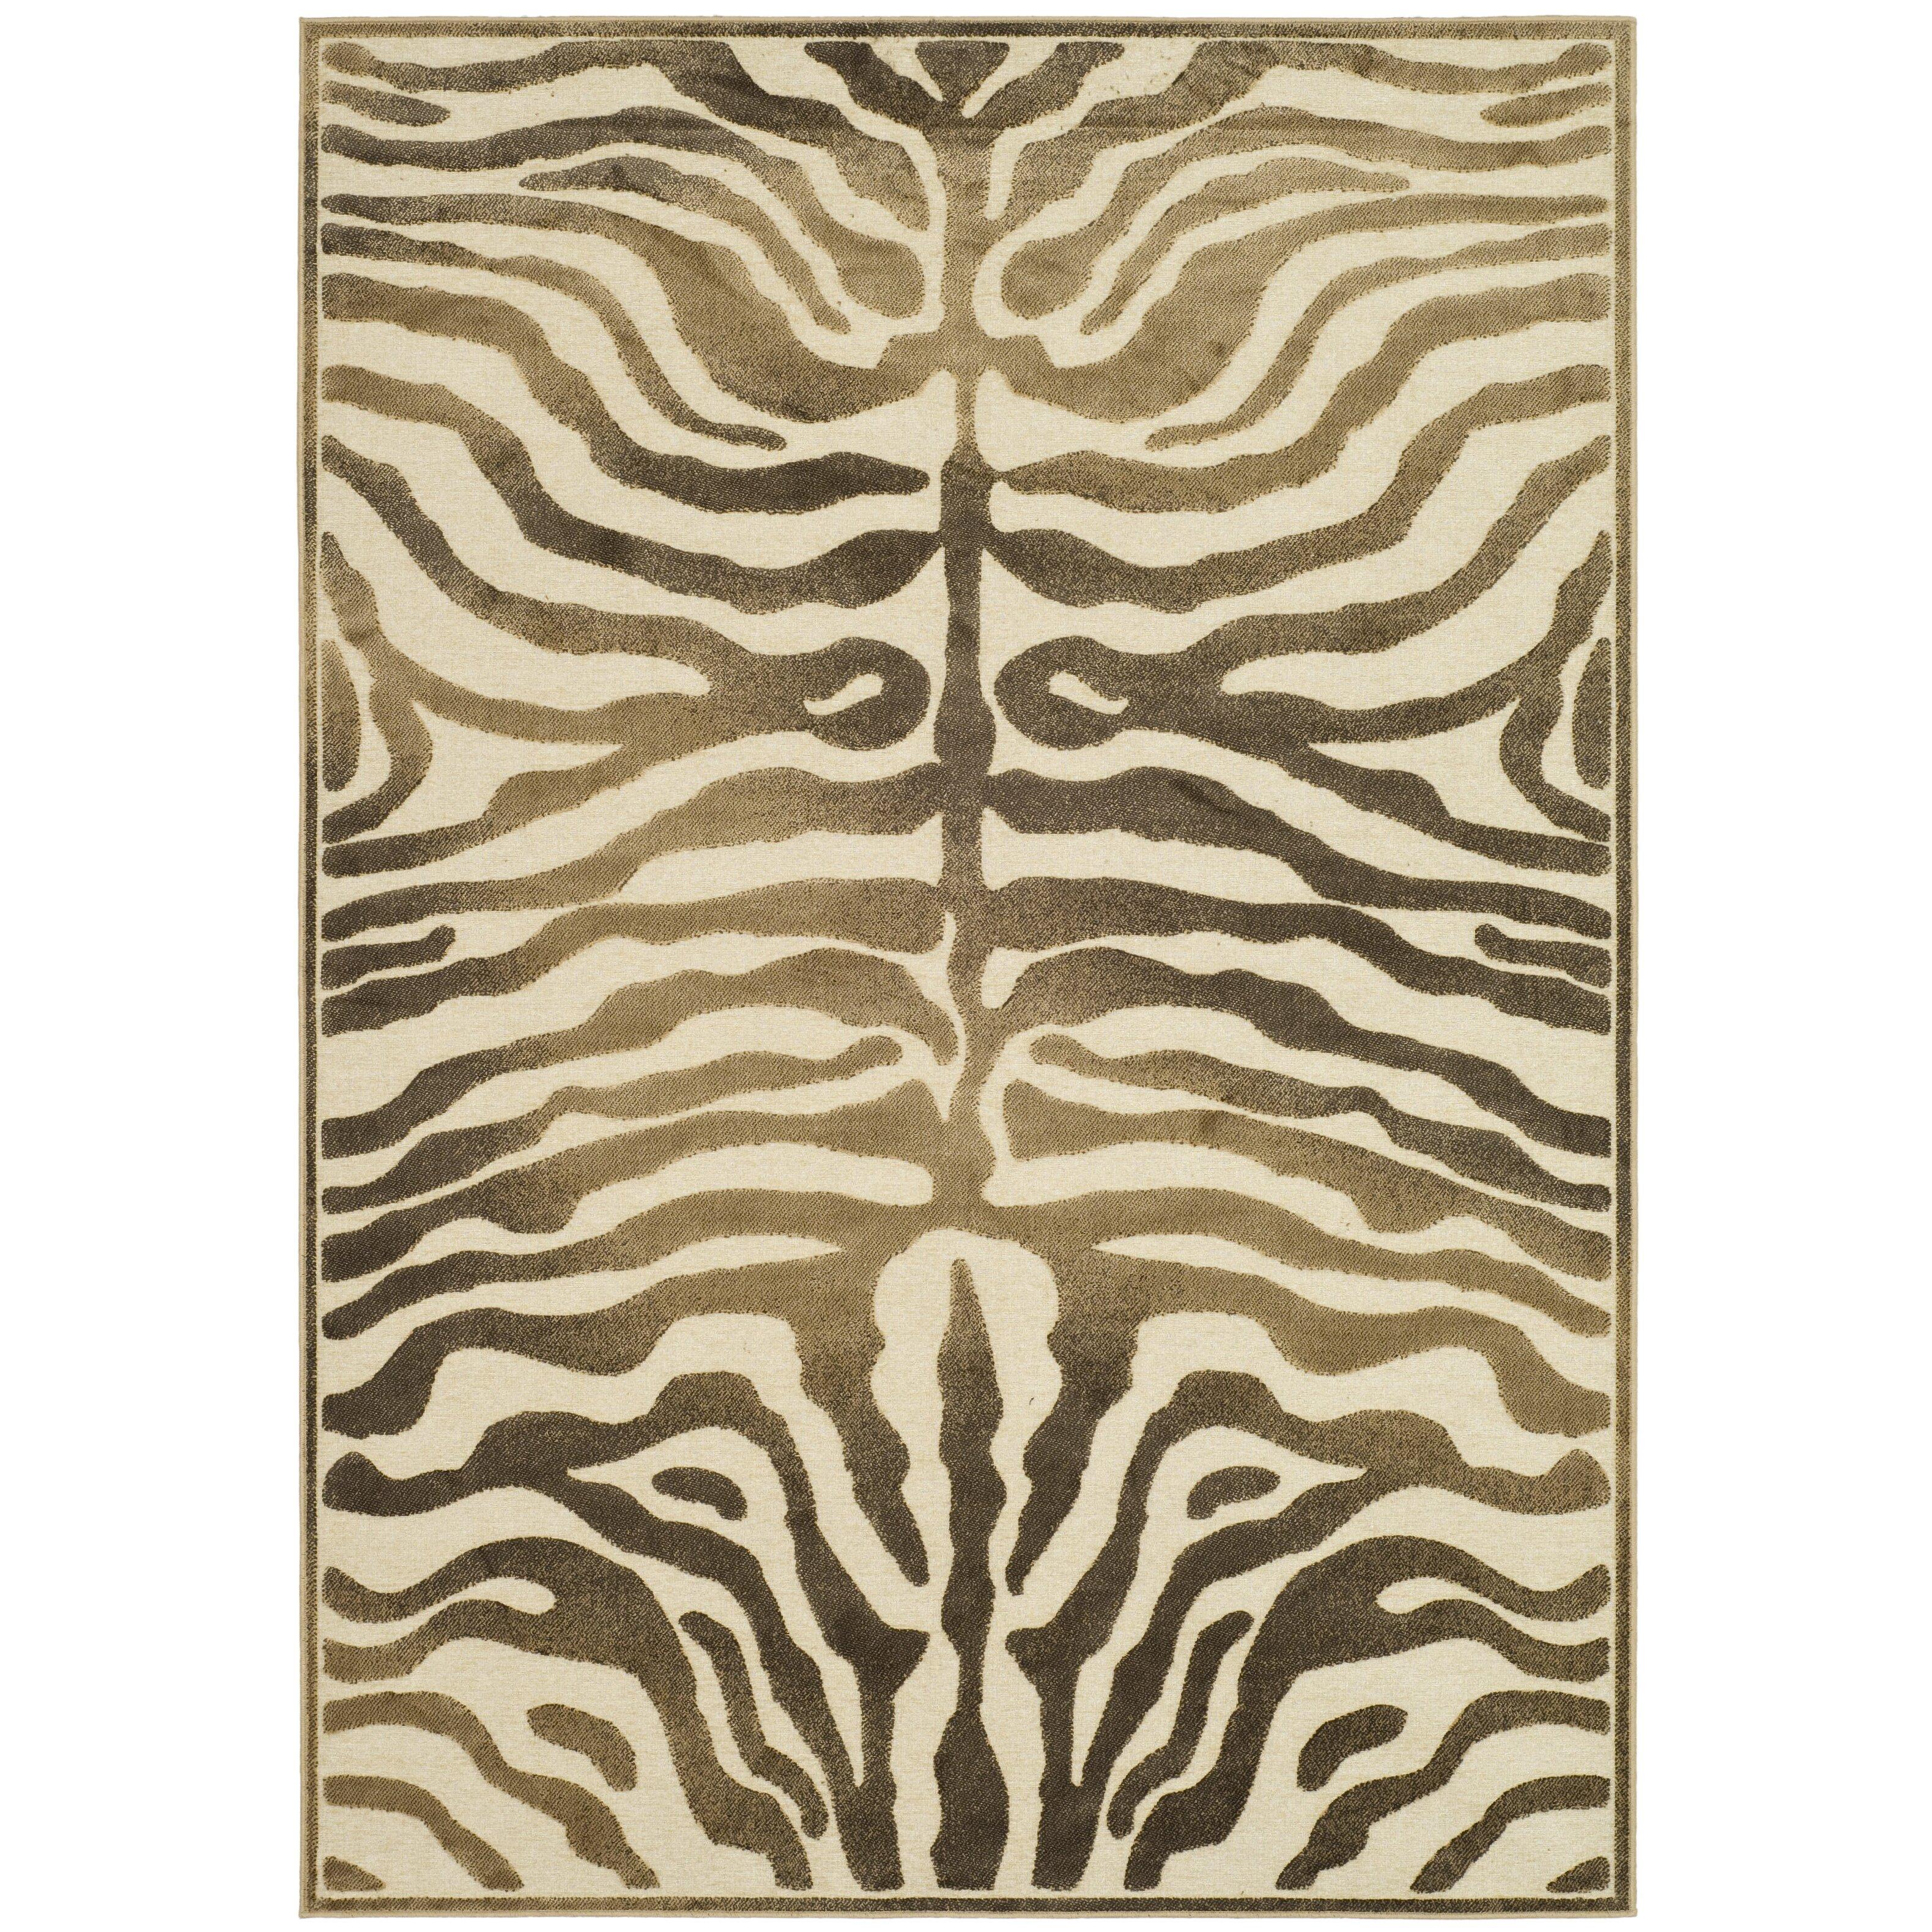 Zebra Rug Wayfair: World Menagerie Linden Zebra Brown Area Rug & Reviews